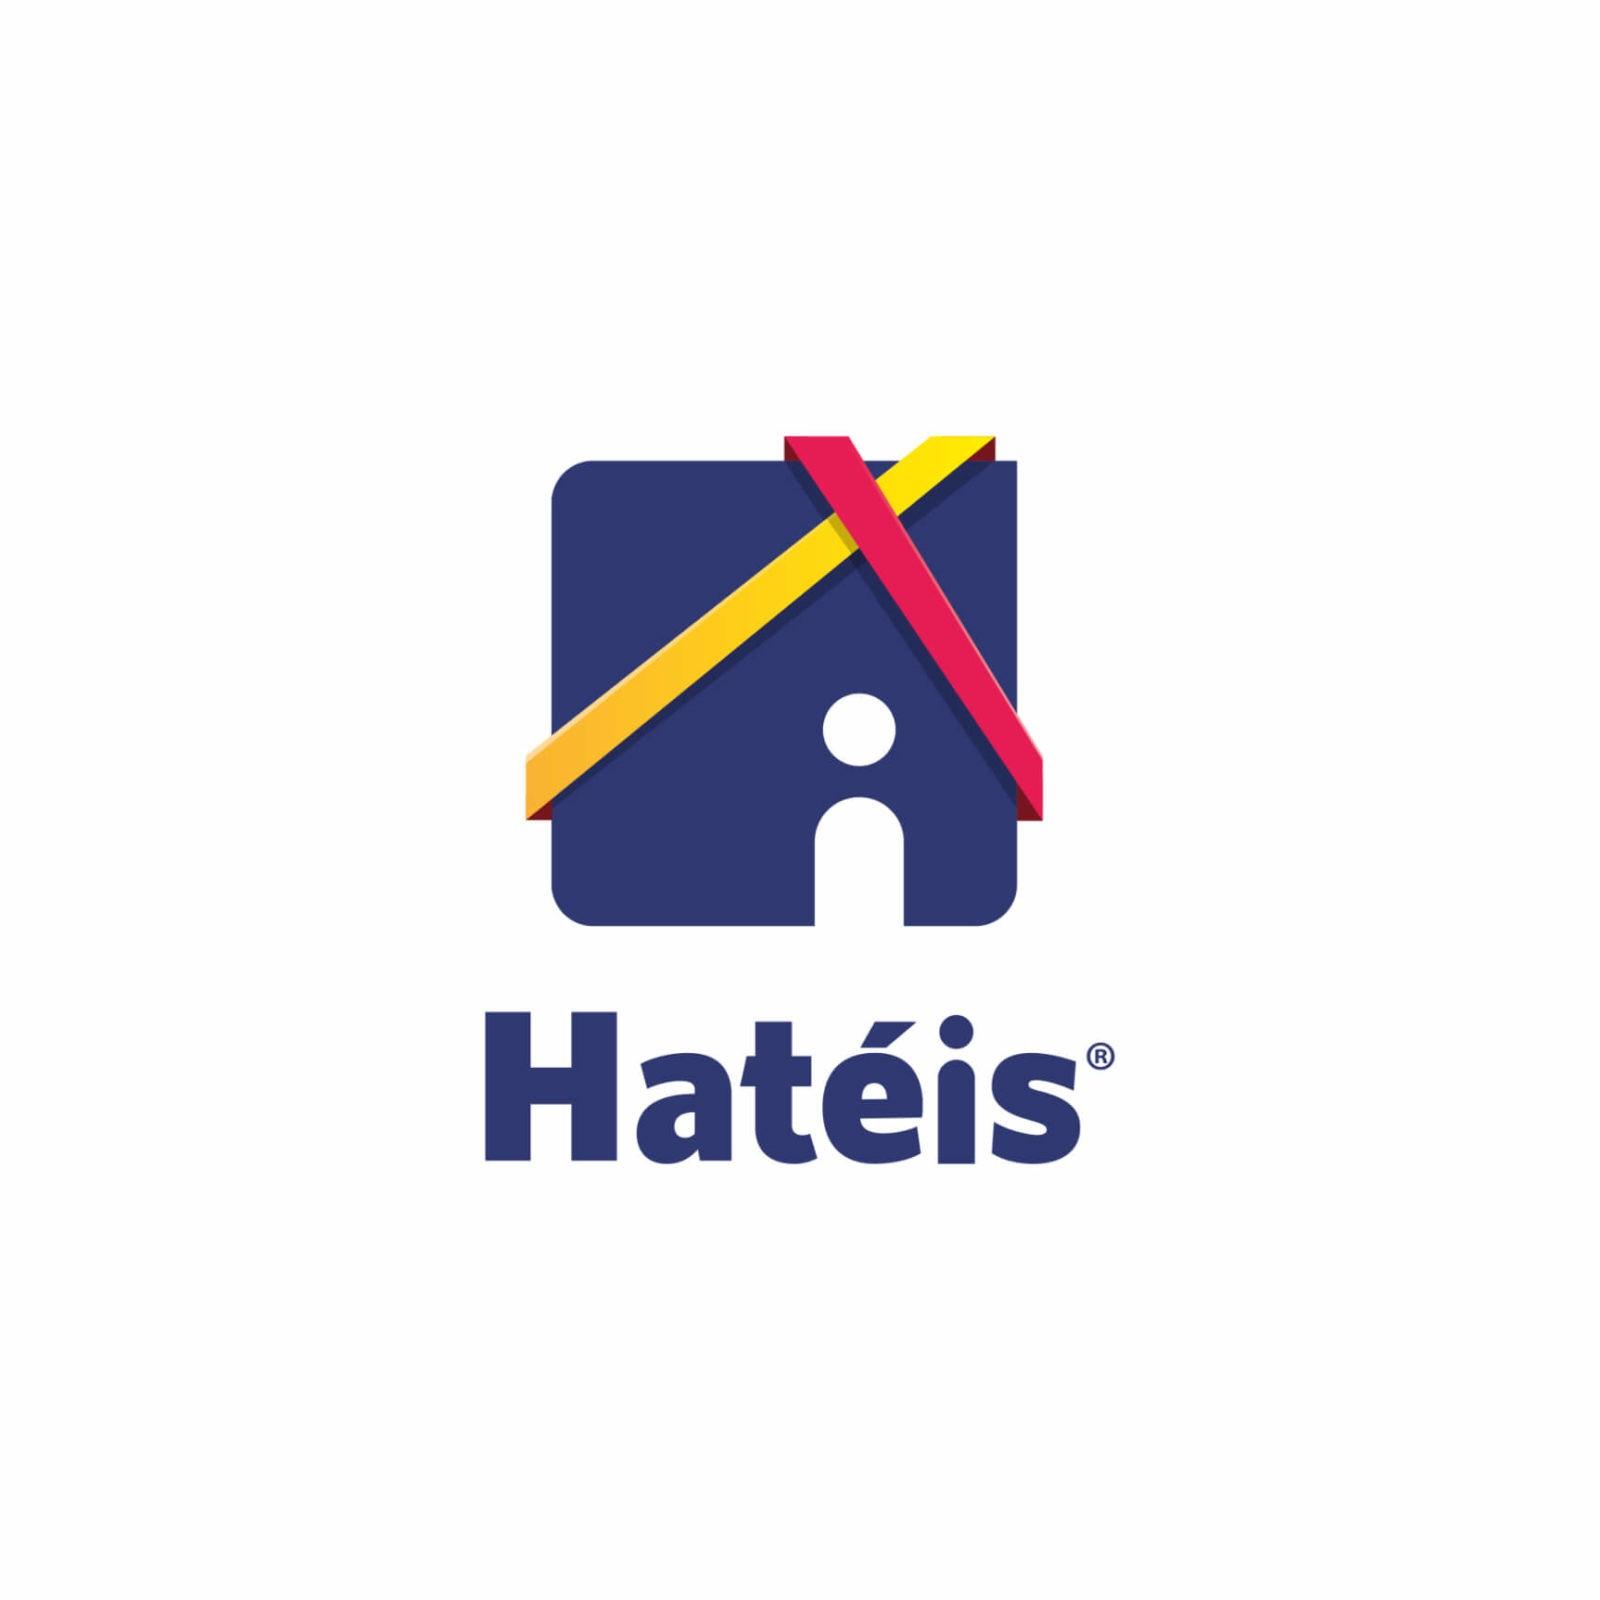 hateis-habitat-logotype